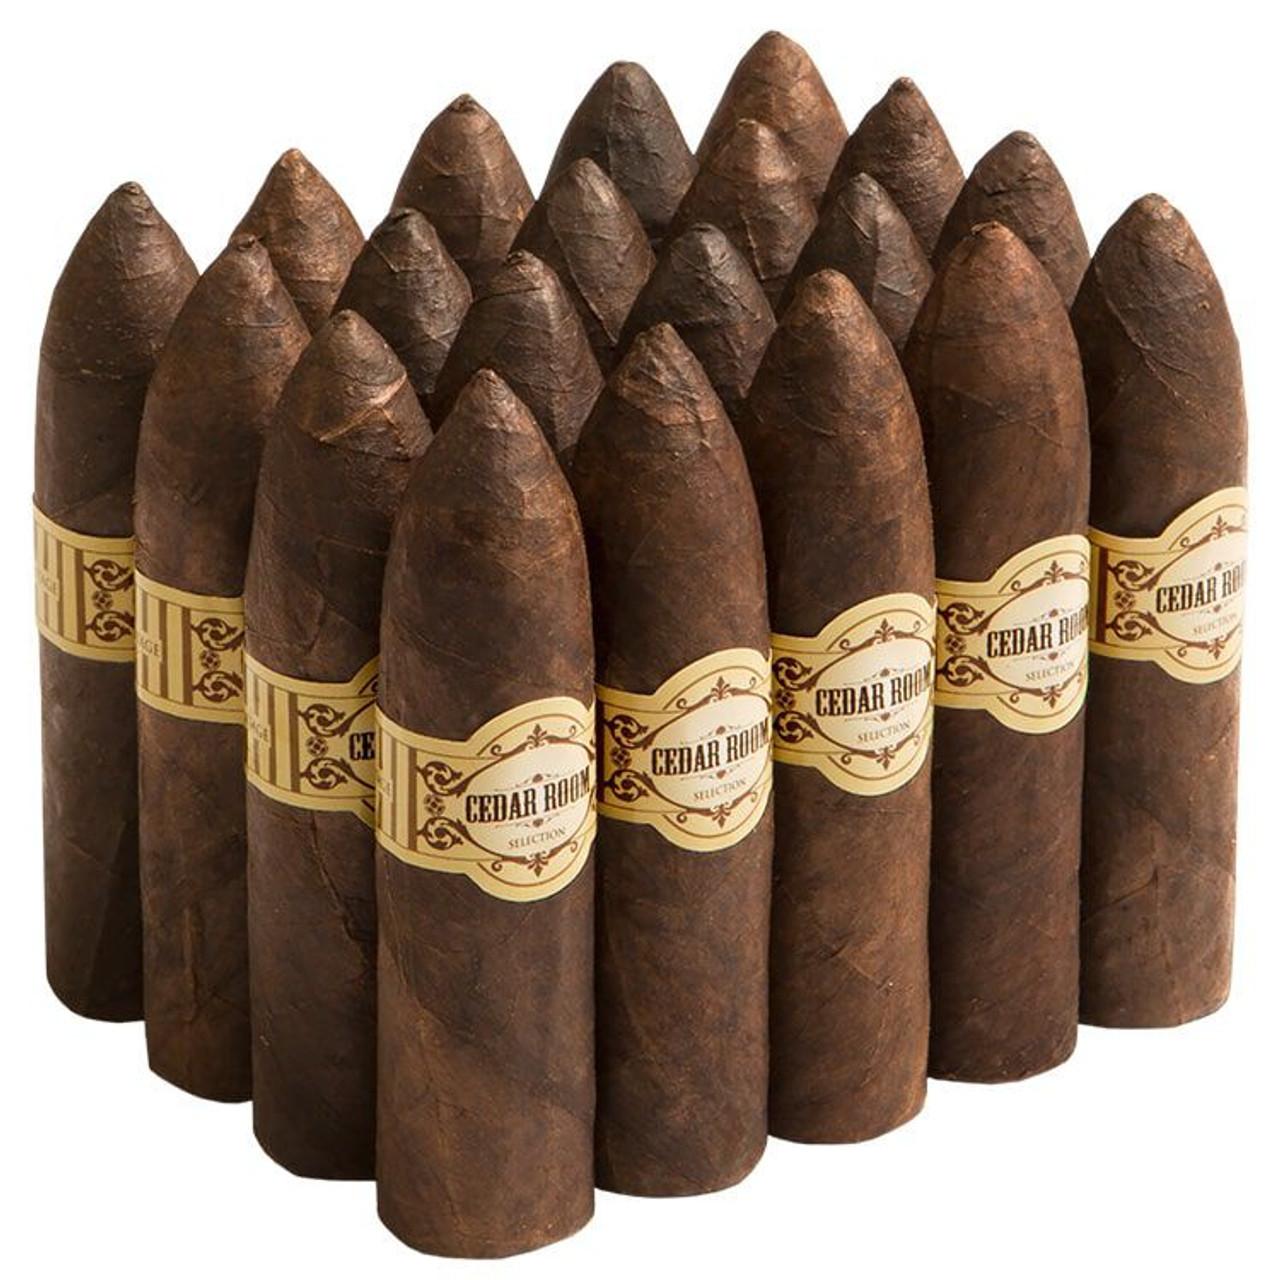 Cedar Room Short Magnum Cigars - 4 x 60 (Bundle of 20)